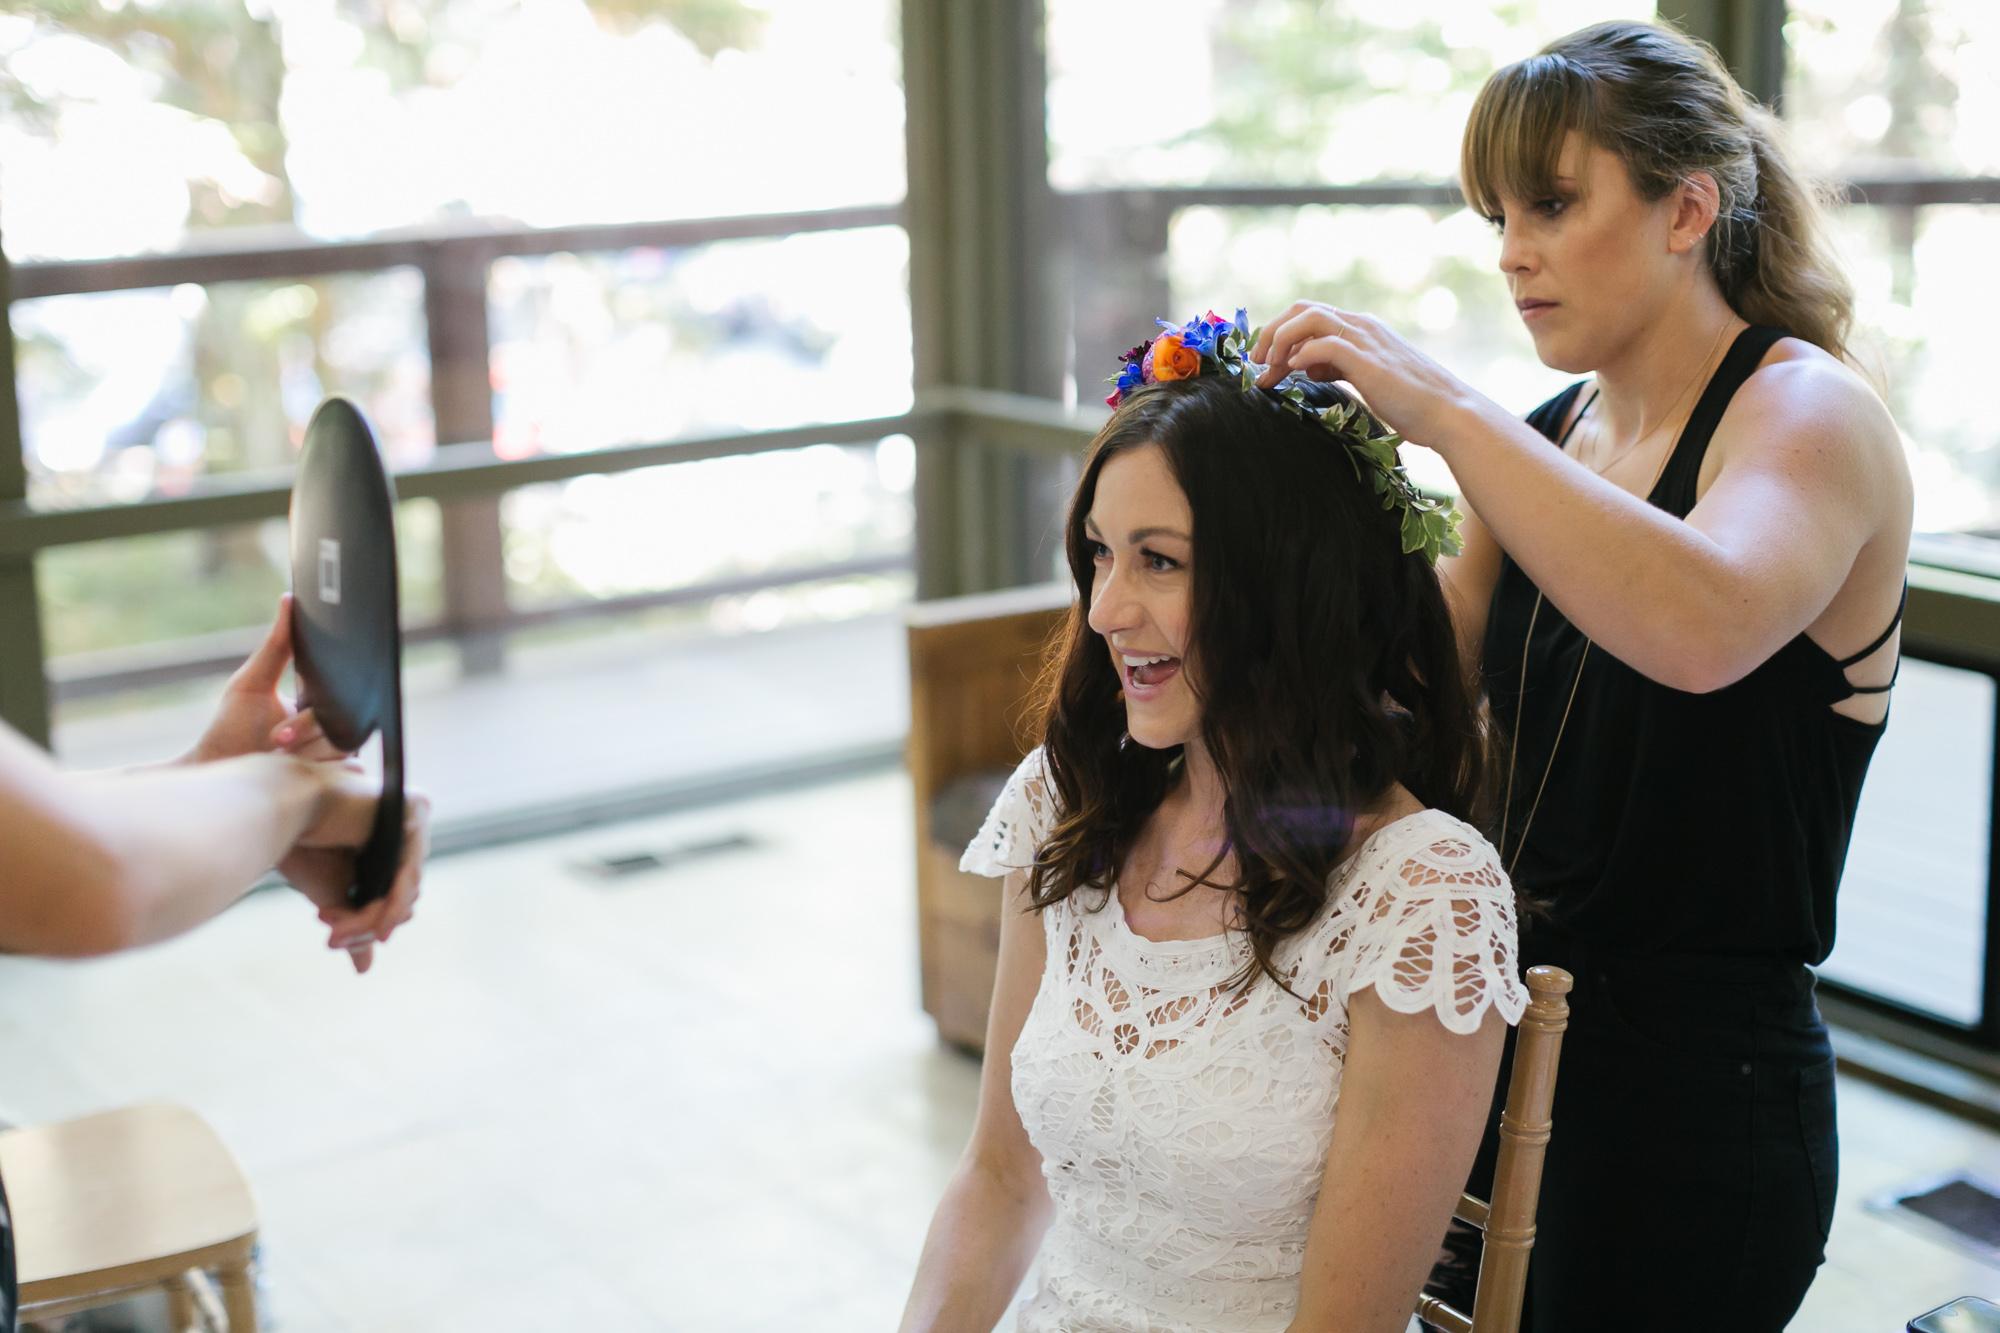 Hairstylist adjust bride's flower crown in front of a mirror